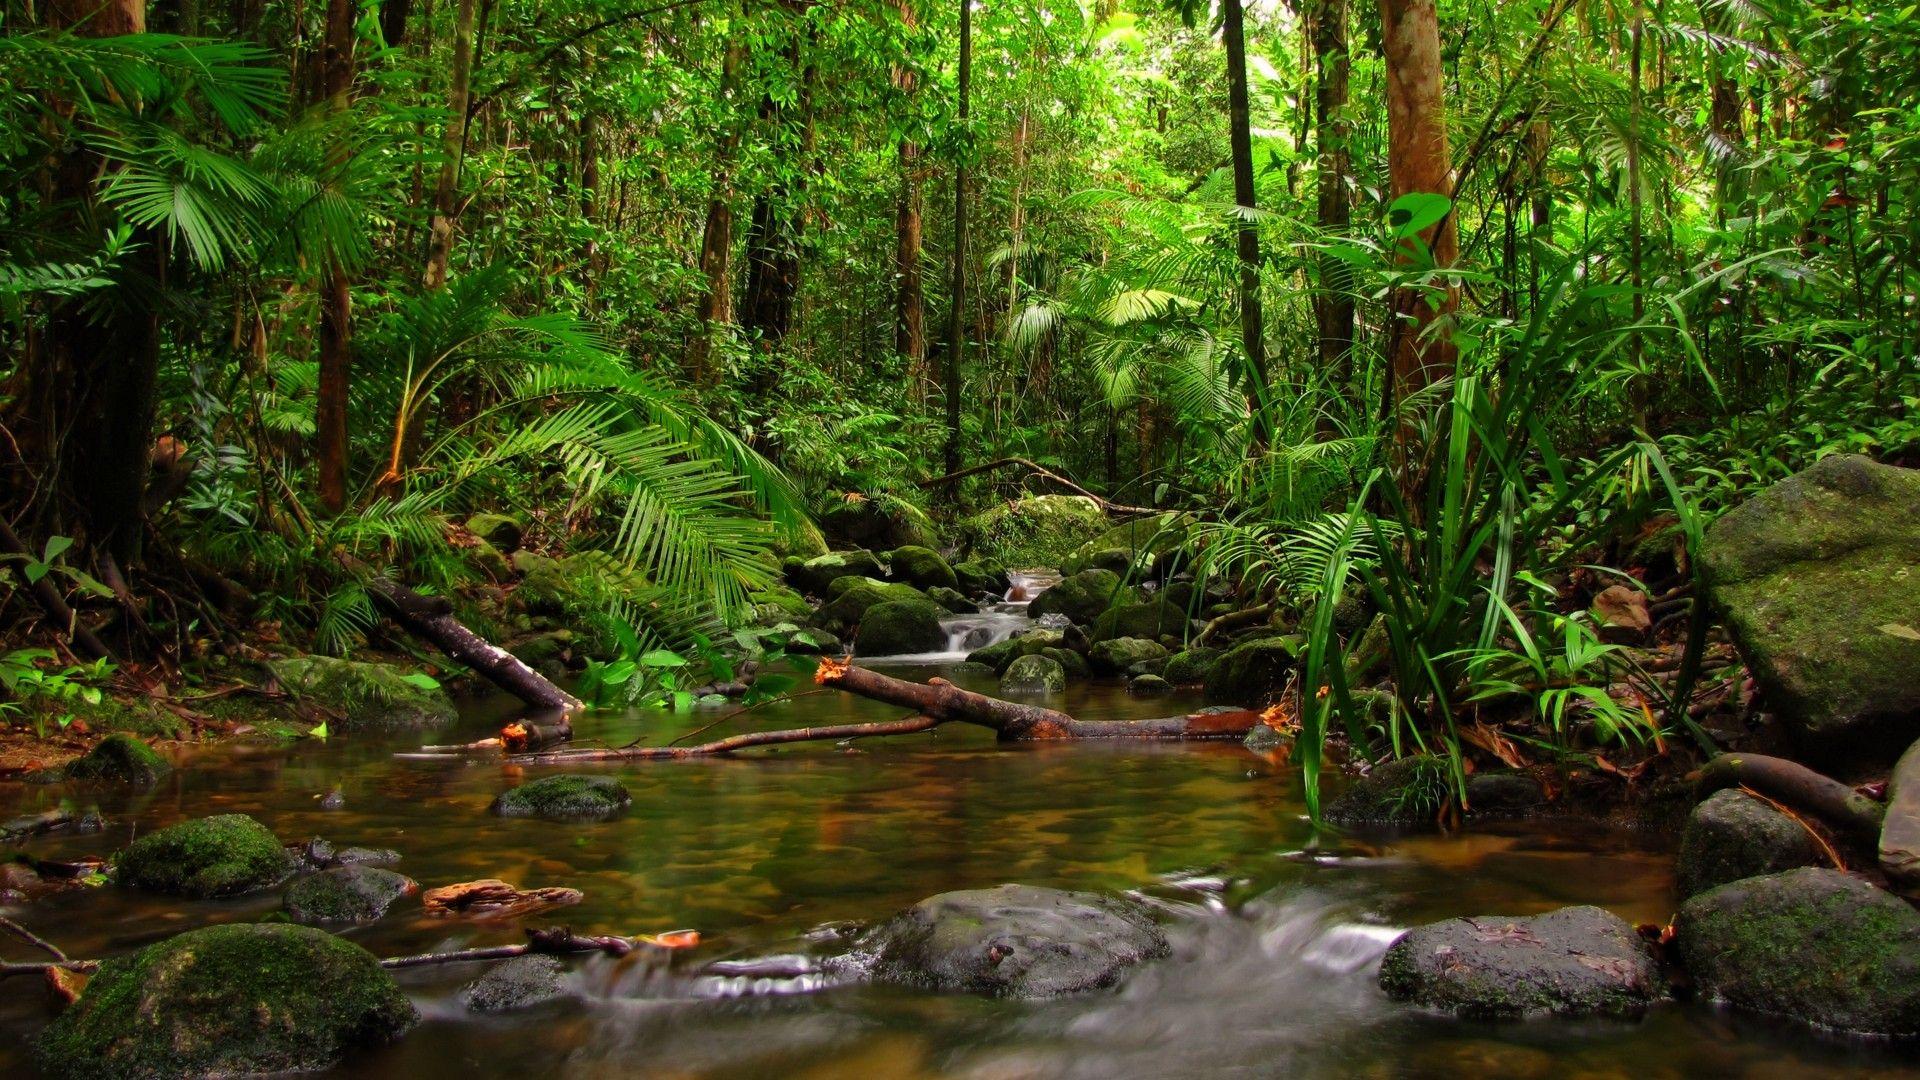 River Jungle Forest Nature HD 1920x1080 | Desktop Wallpaper in 2019 | Rainforest pictures ...